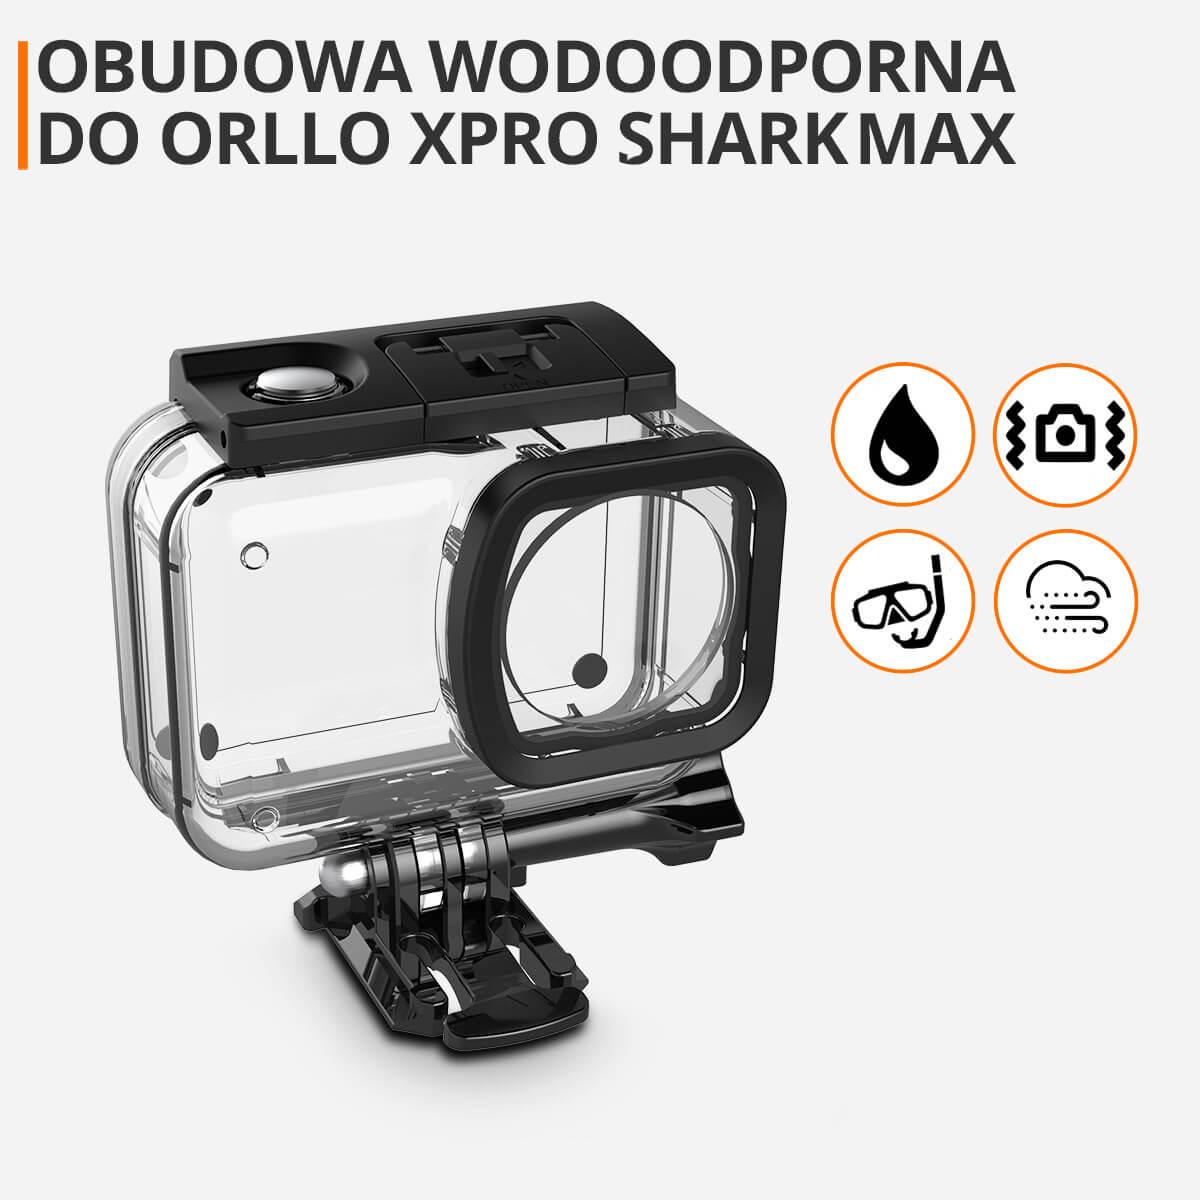 obudowa-wodoodporna-do-kamery-sportowej-xpro-shark-max-orllo-pl